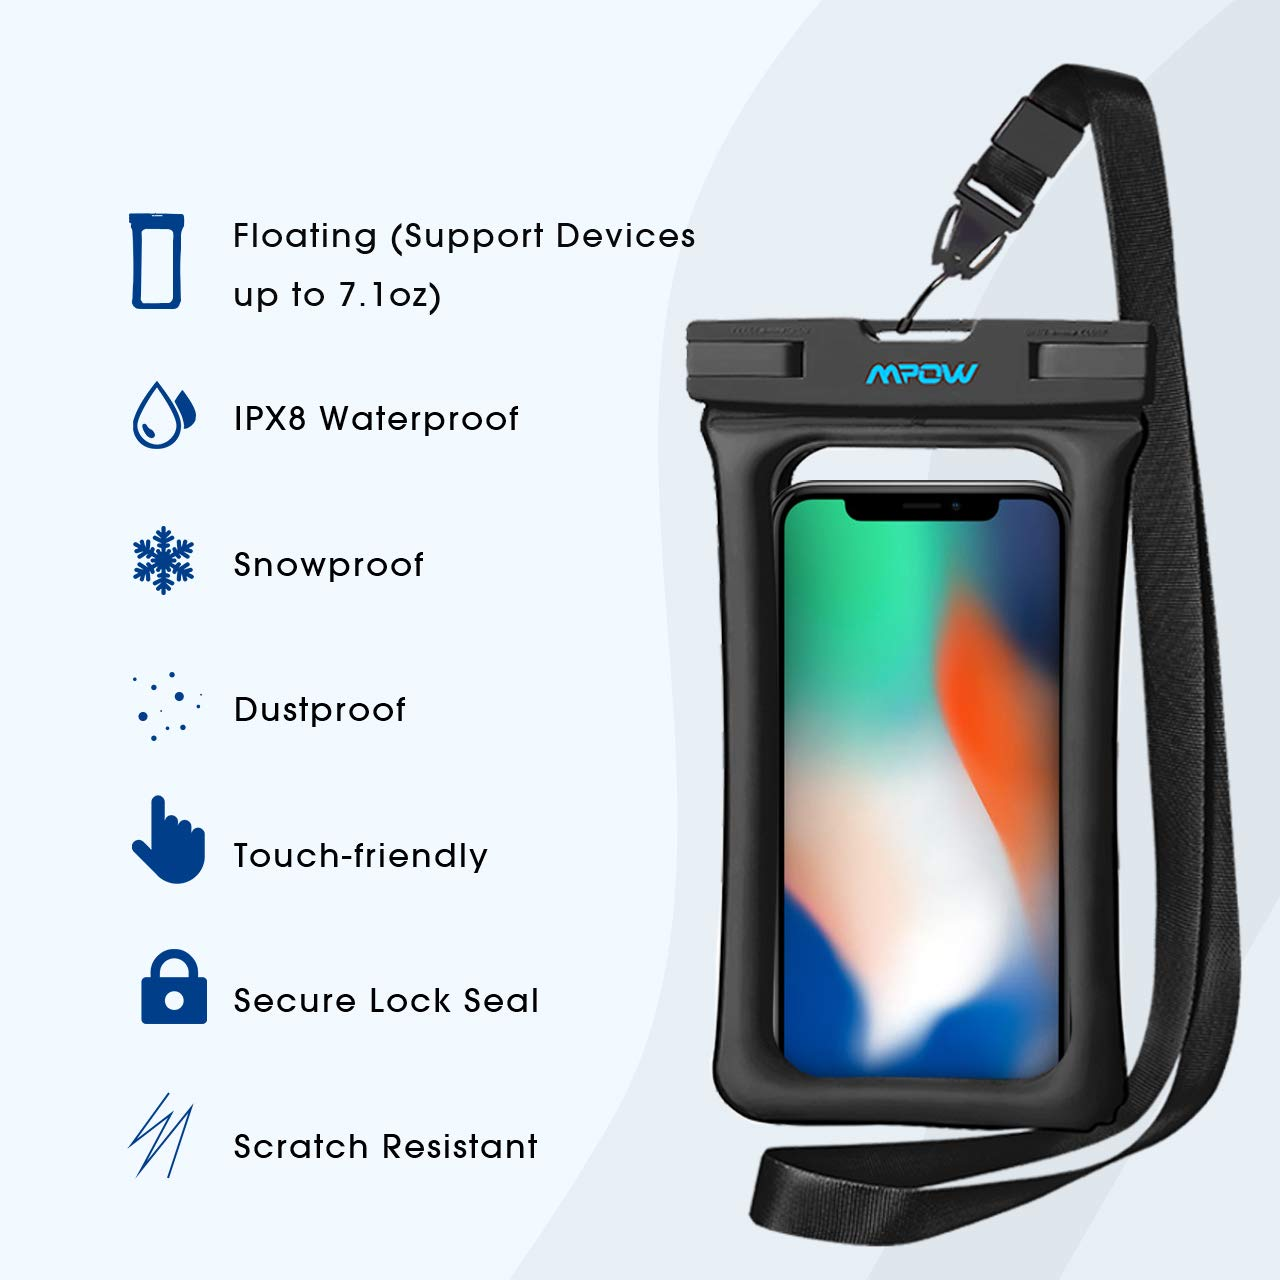 Amazon.com: Mpow Funda impermeable flotante para teléfono ...